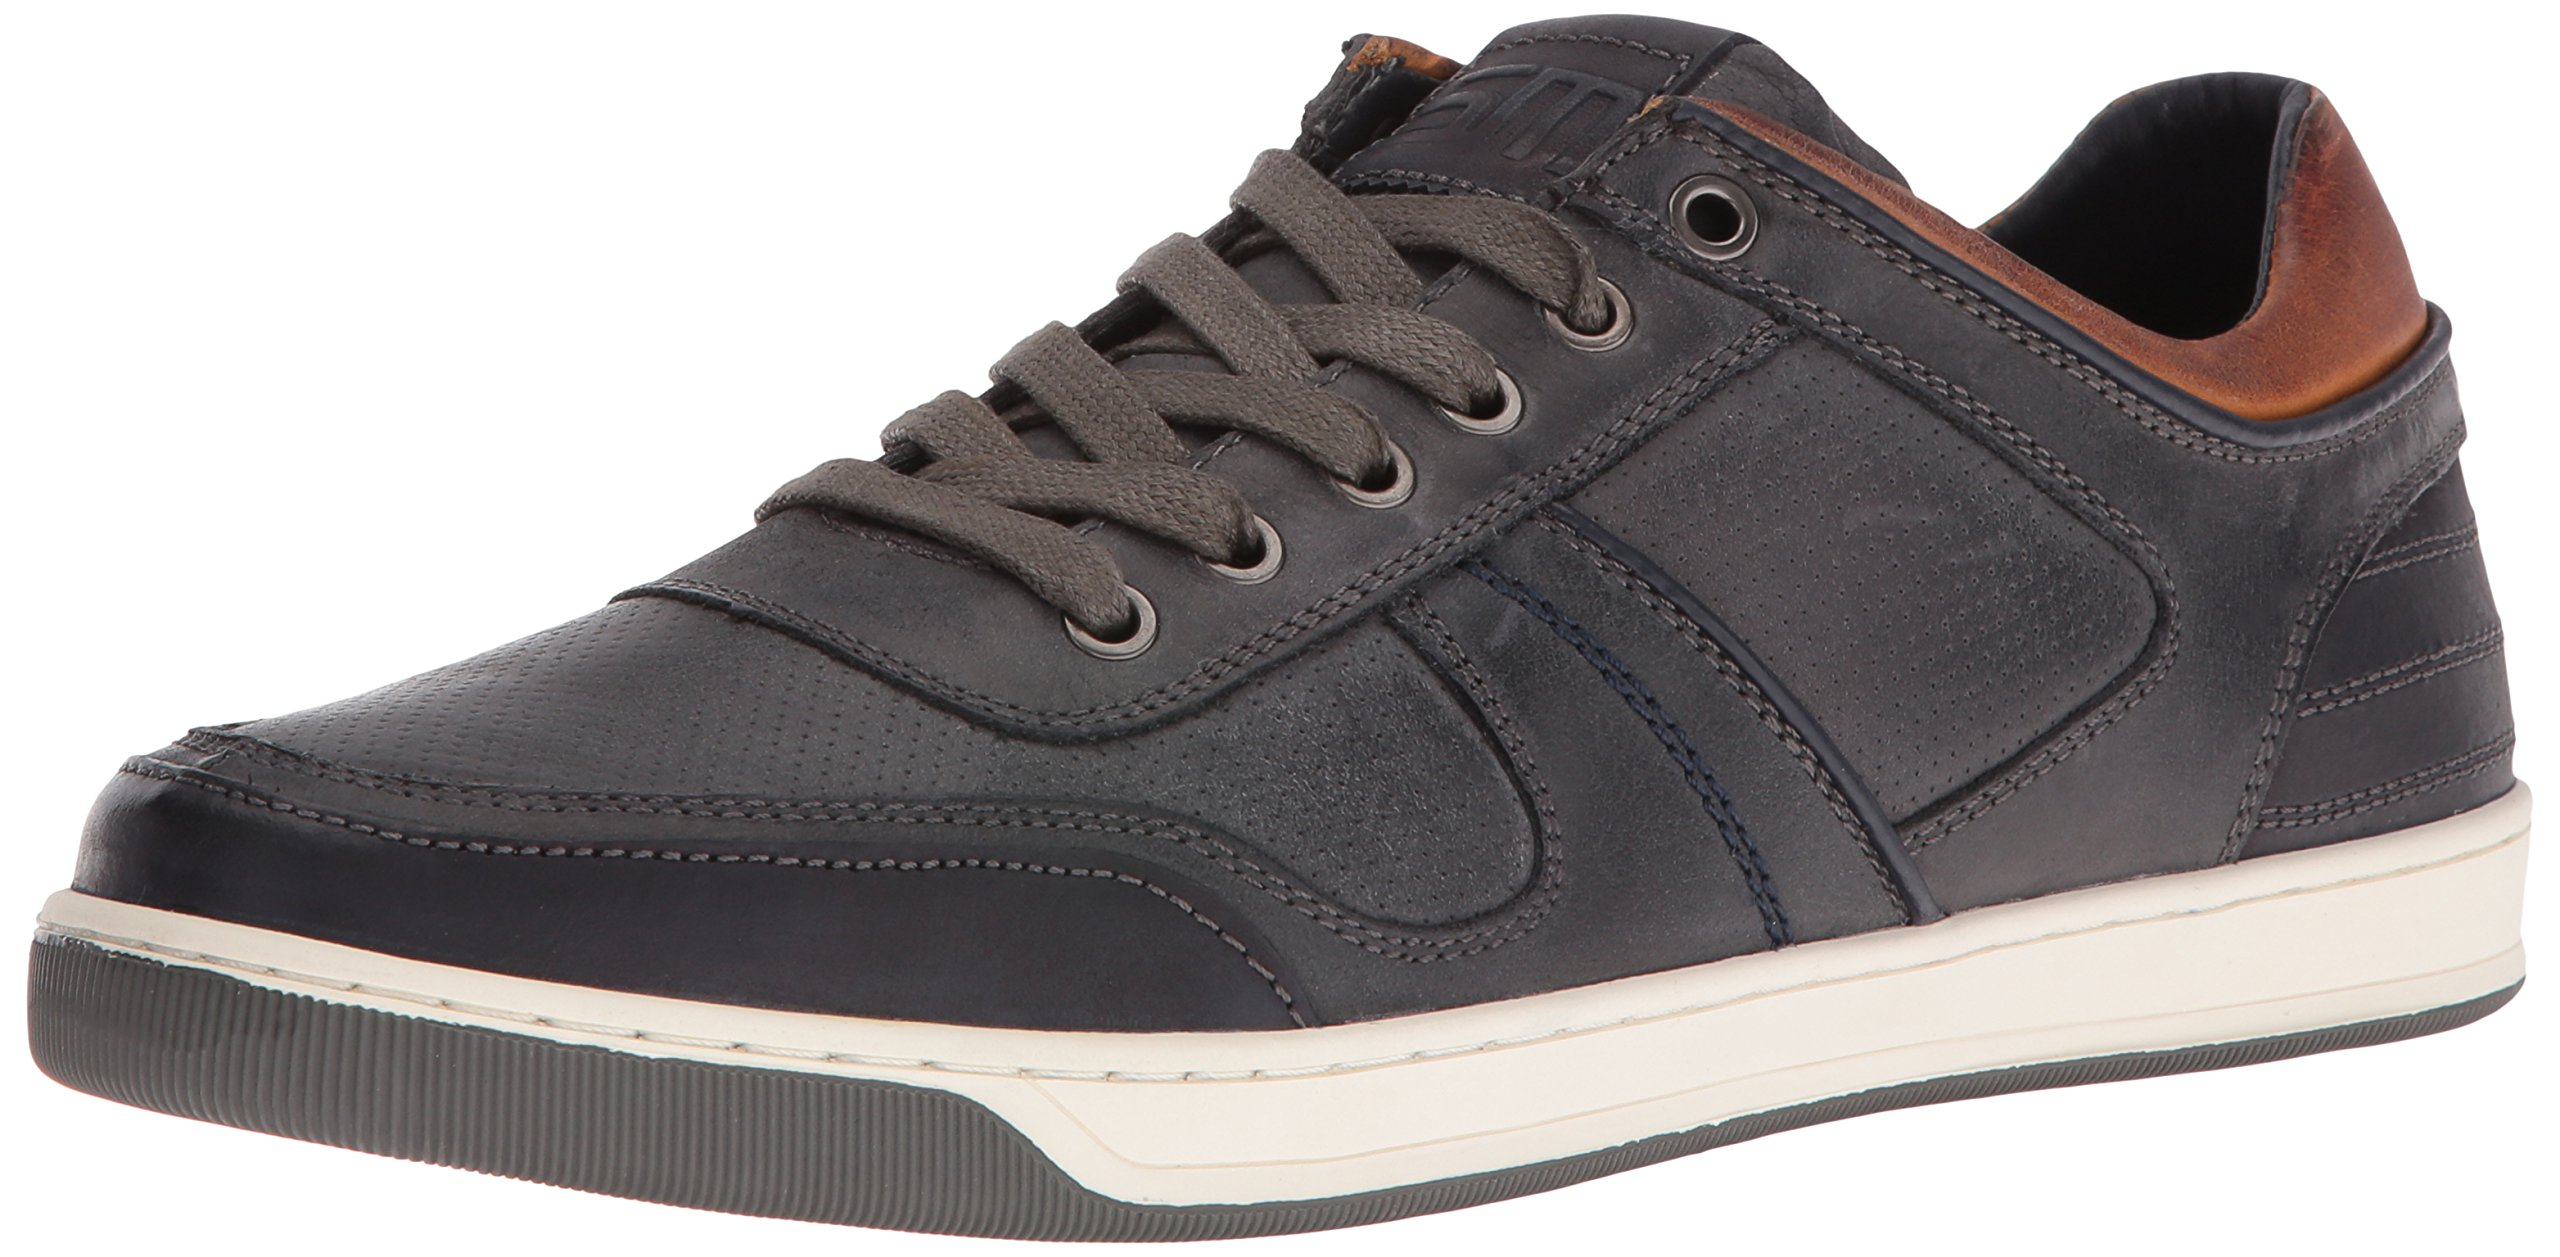 Steve Madden Men's Cantor Fashion Sneaker, Grey Leather, 7.5 M US